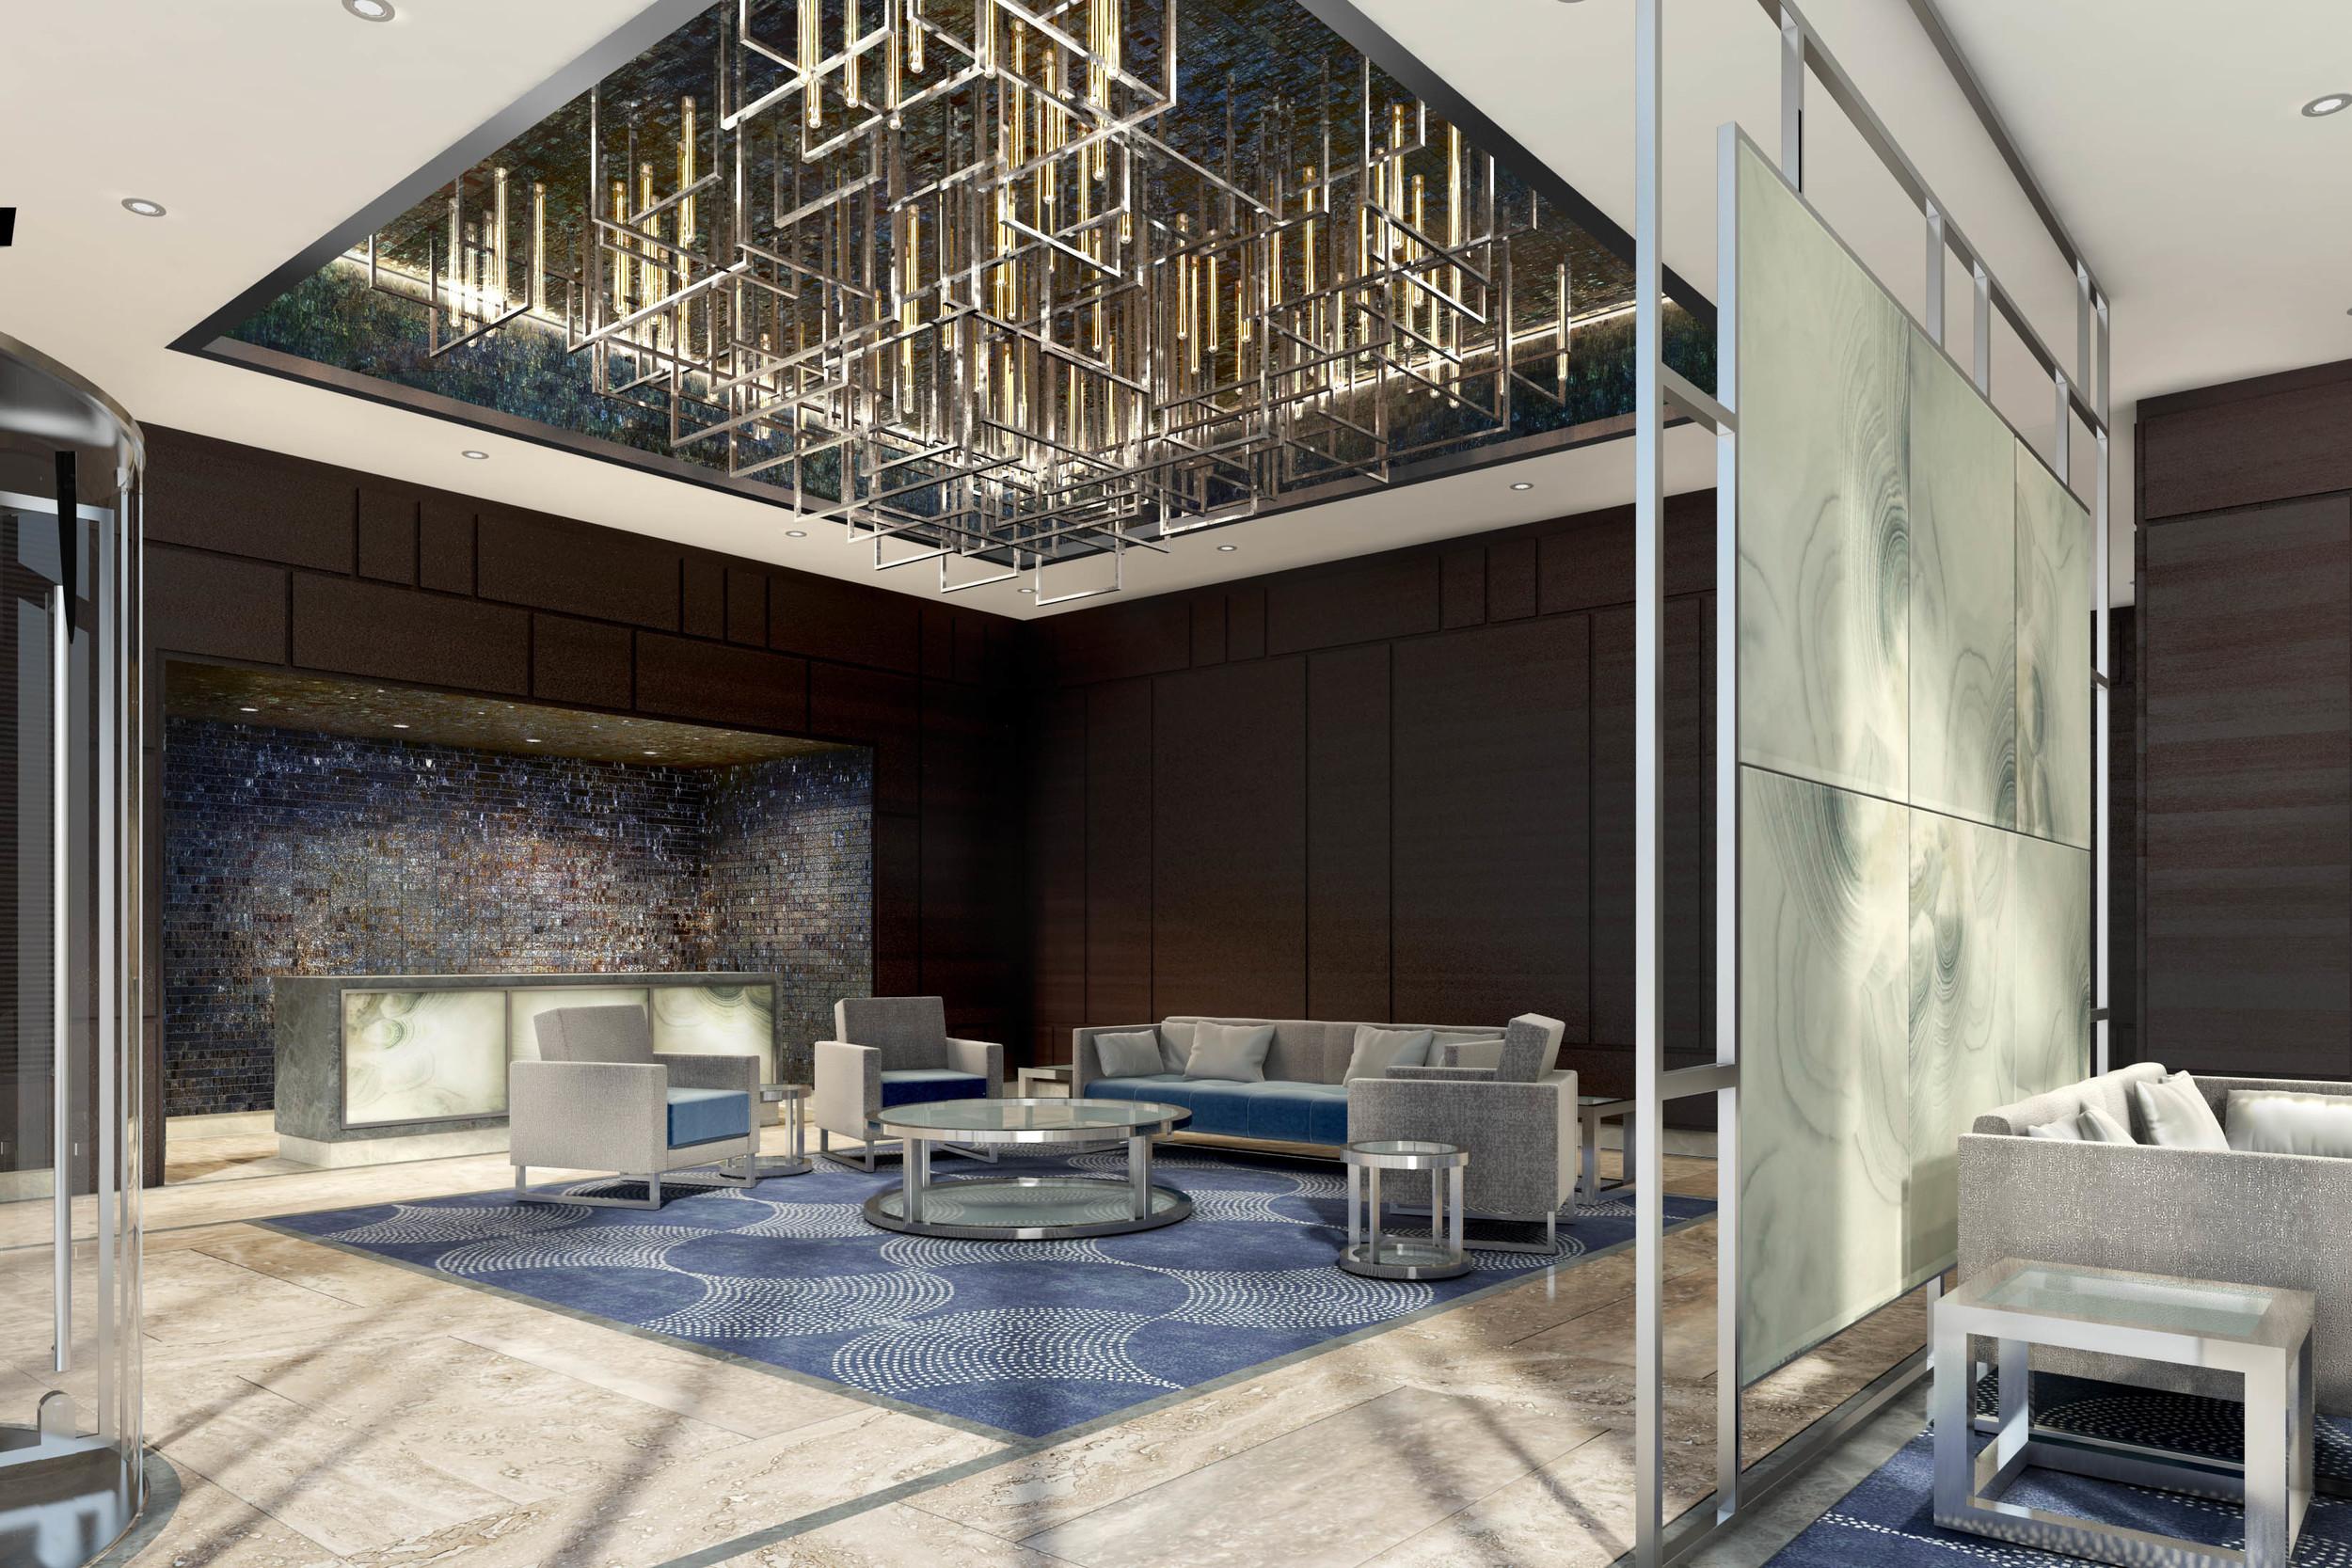 S300_Building4lobbyView01_2014-01-16.jpg